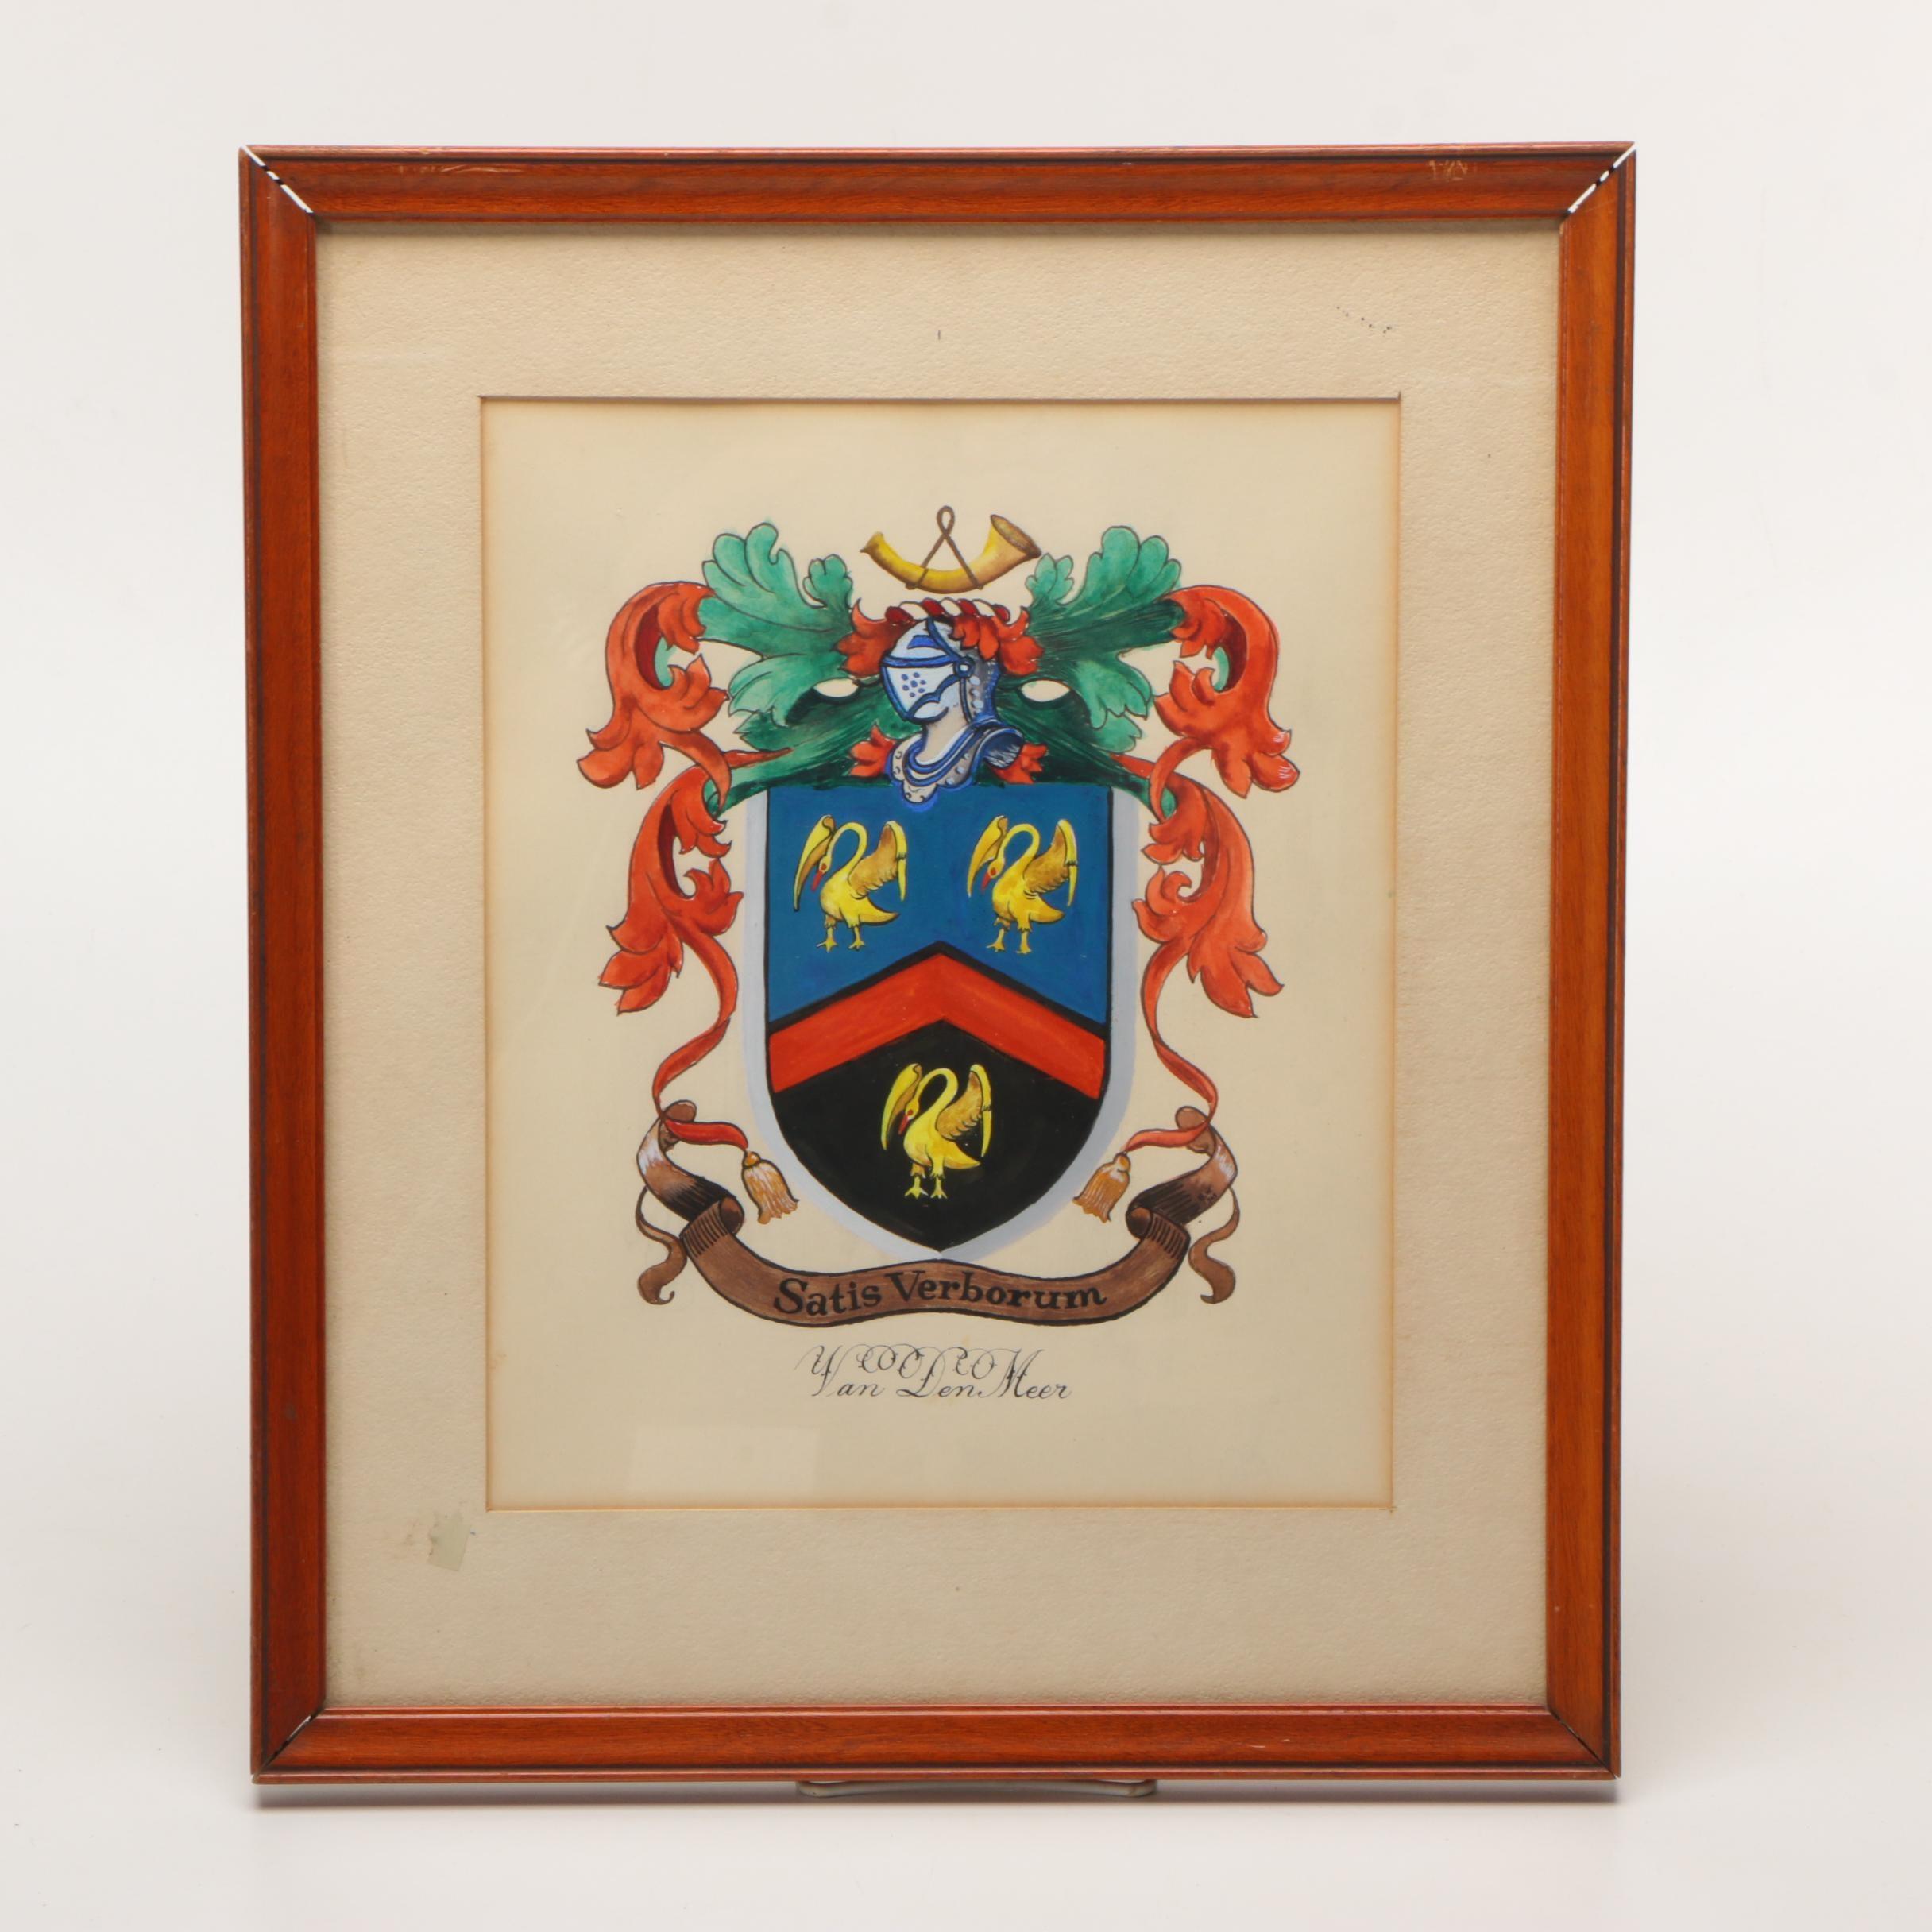 Watercolor and Gouache Painting on Paper of Van Den Meer Family Crest